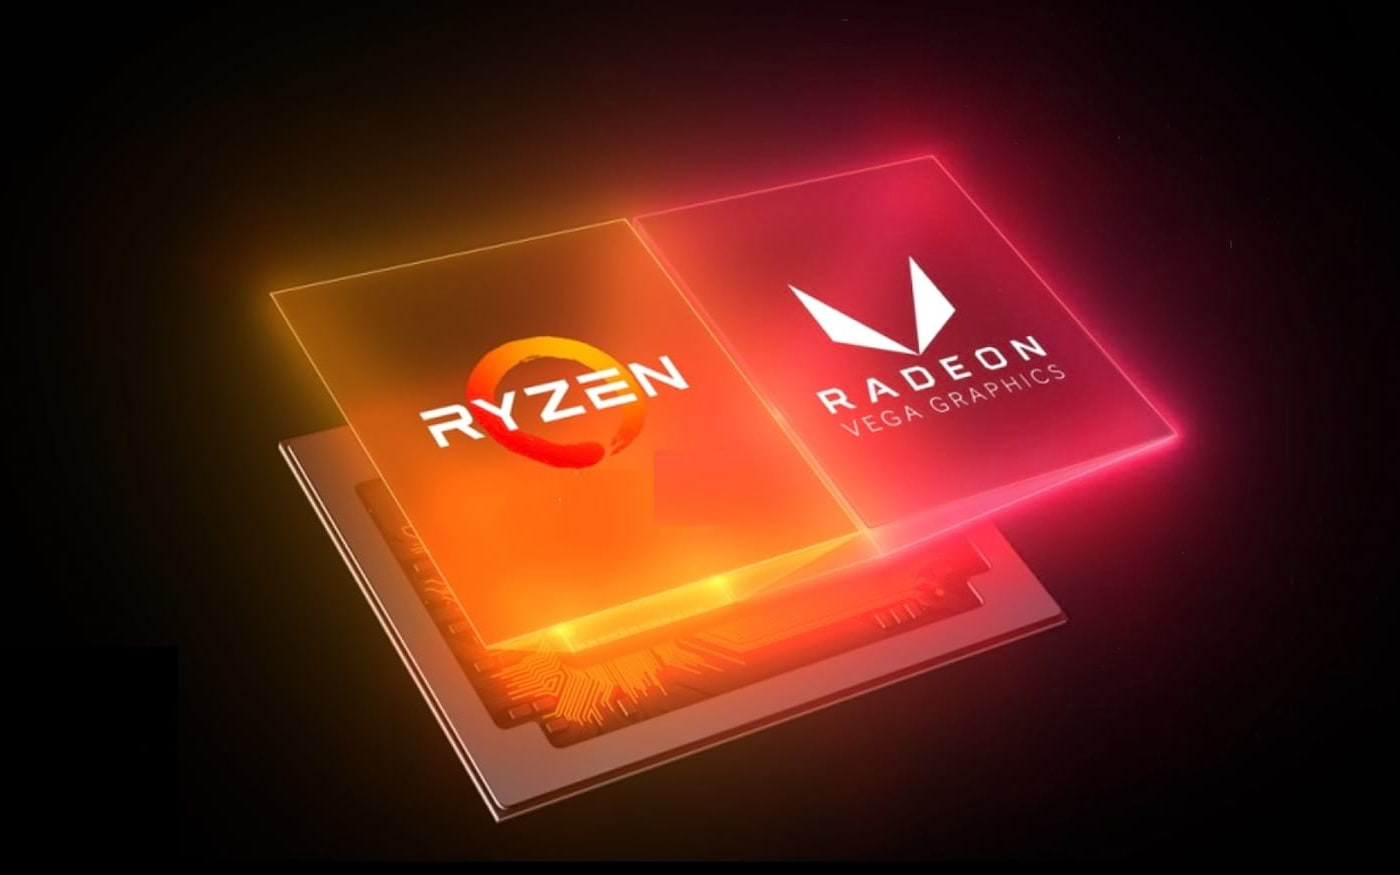 AMD anuncia Ryzen 9 3950X com 16 cores 32 Threads